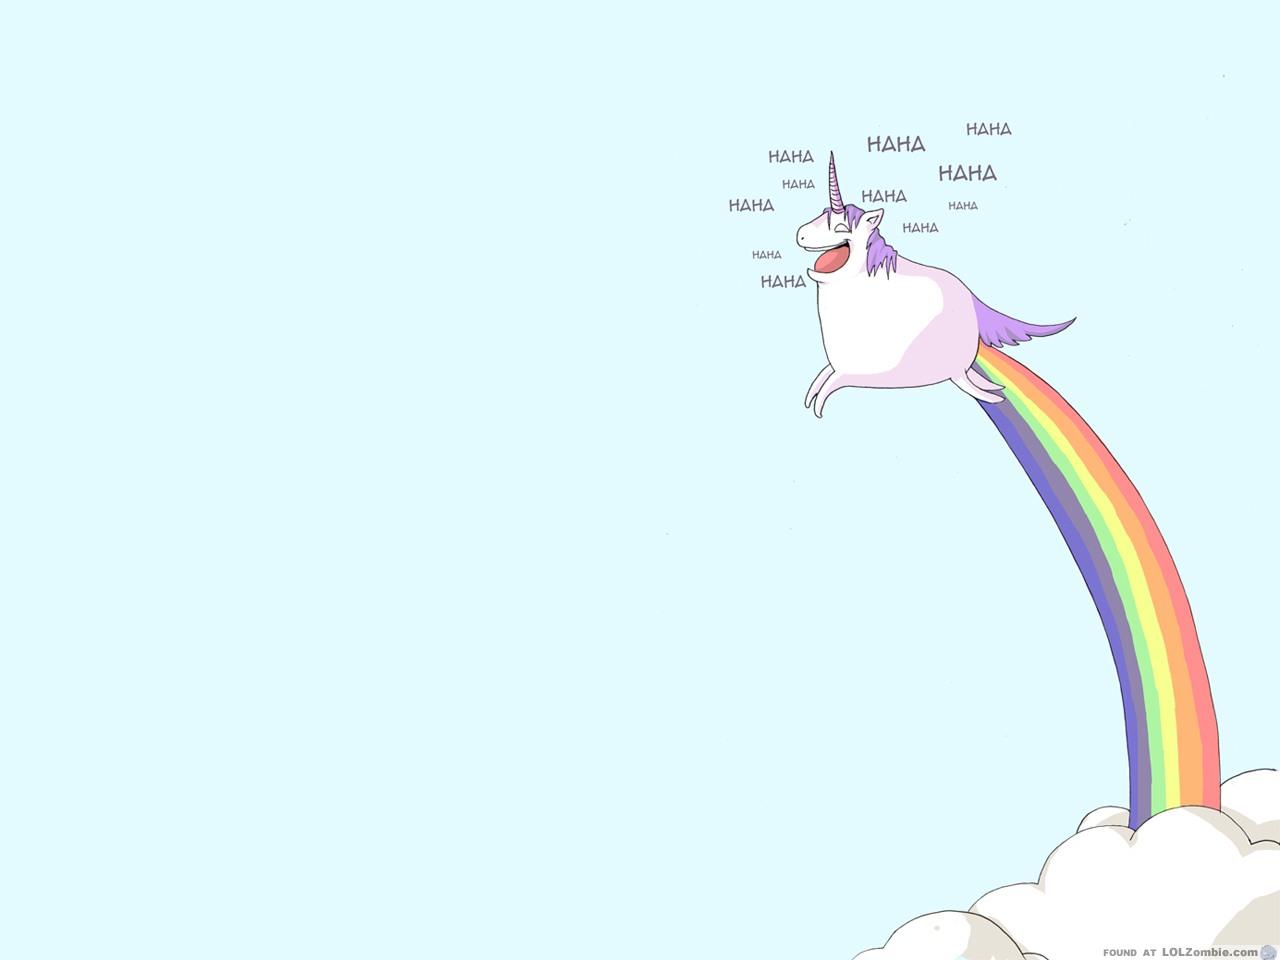 Simple Wallpaper Halloween Unicorn - happy-unicorn  Image_536580.jpg?resize\u003d1280%2C960\u0026ssl\u003d1